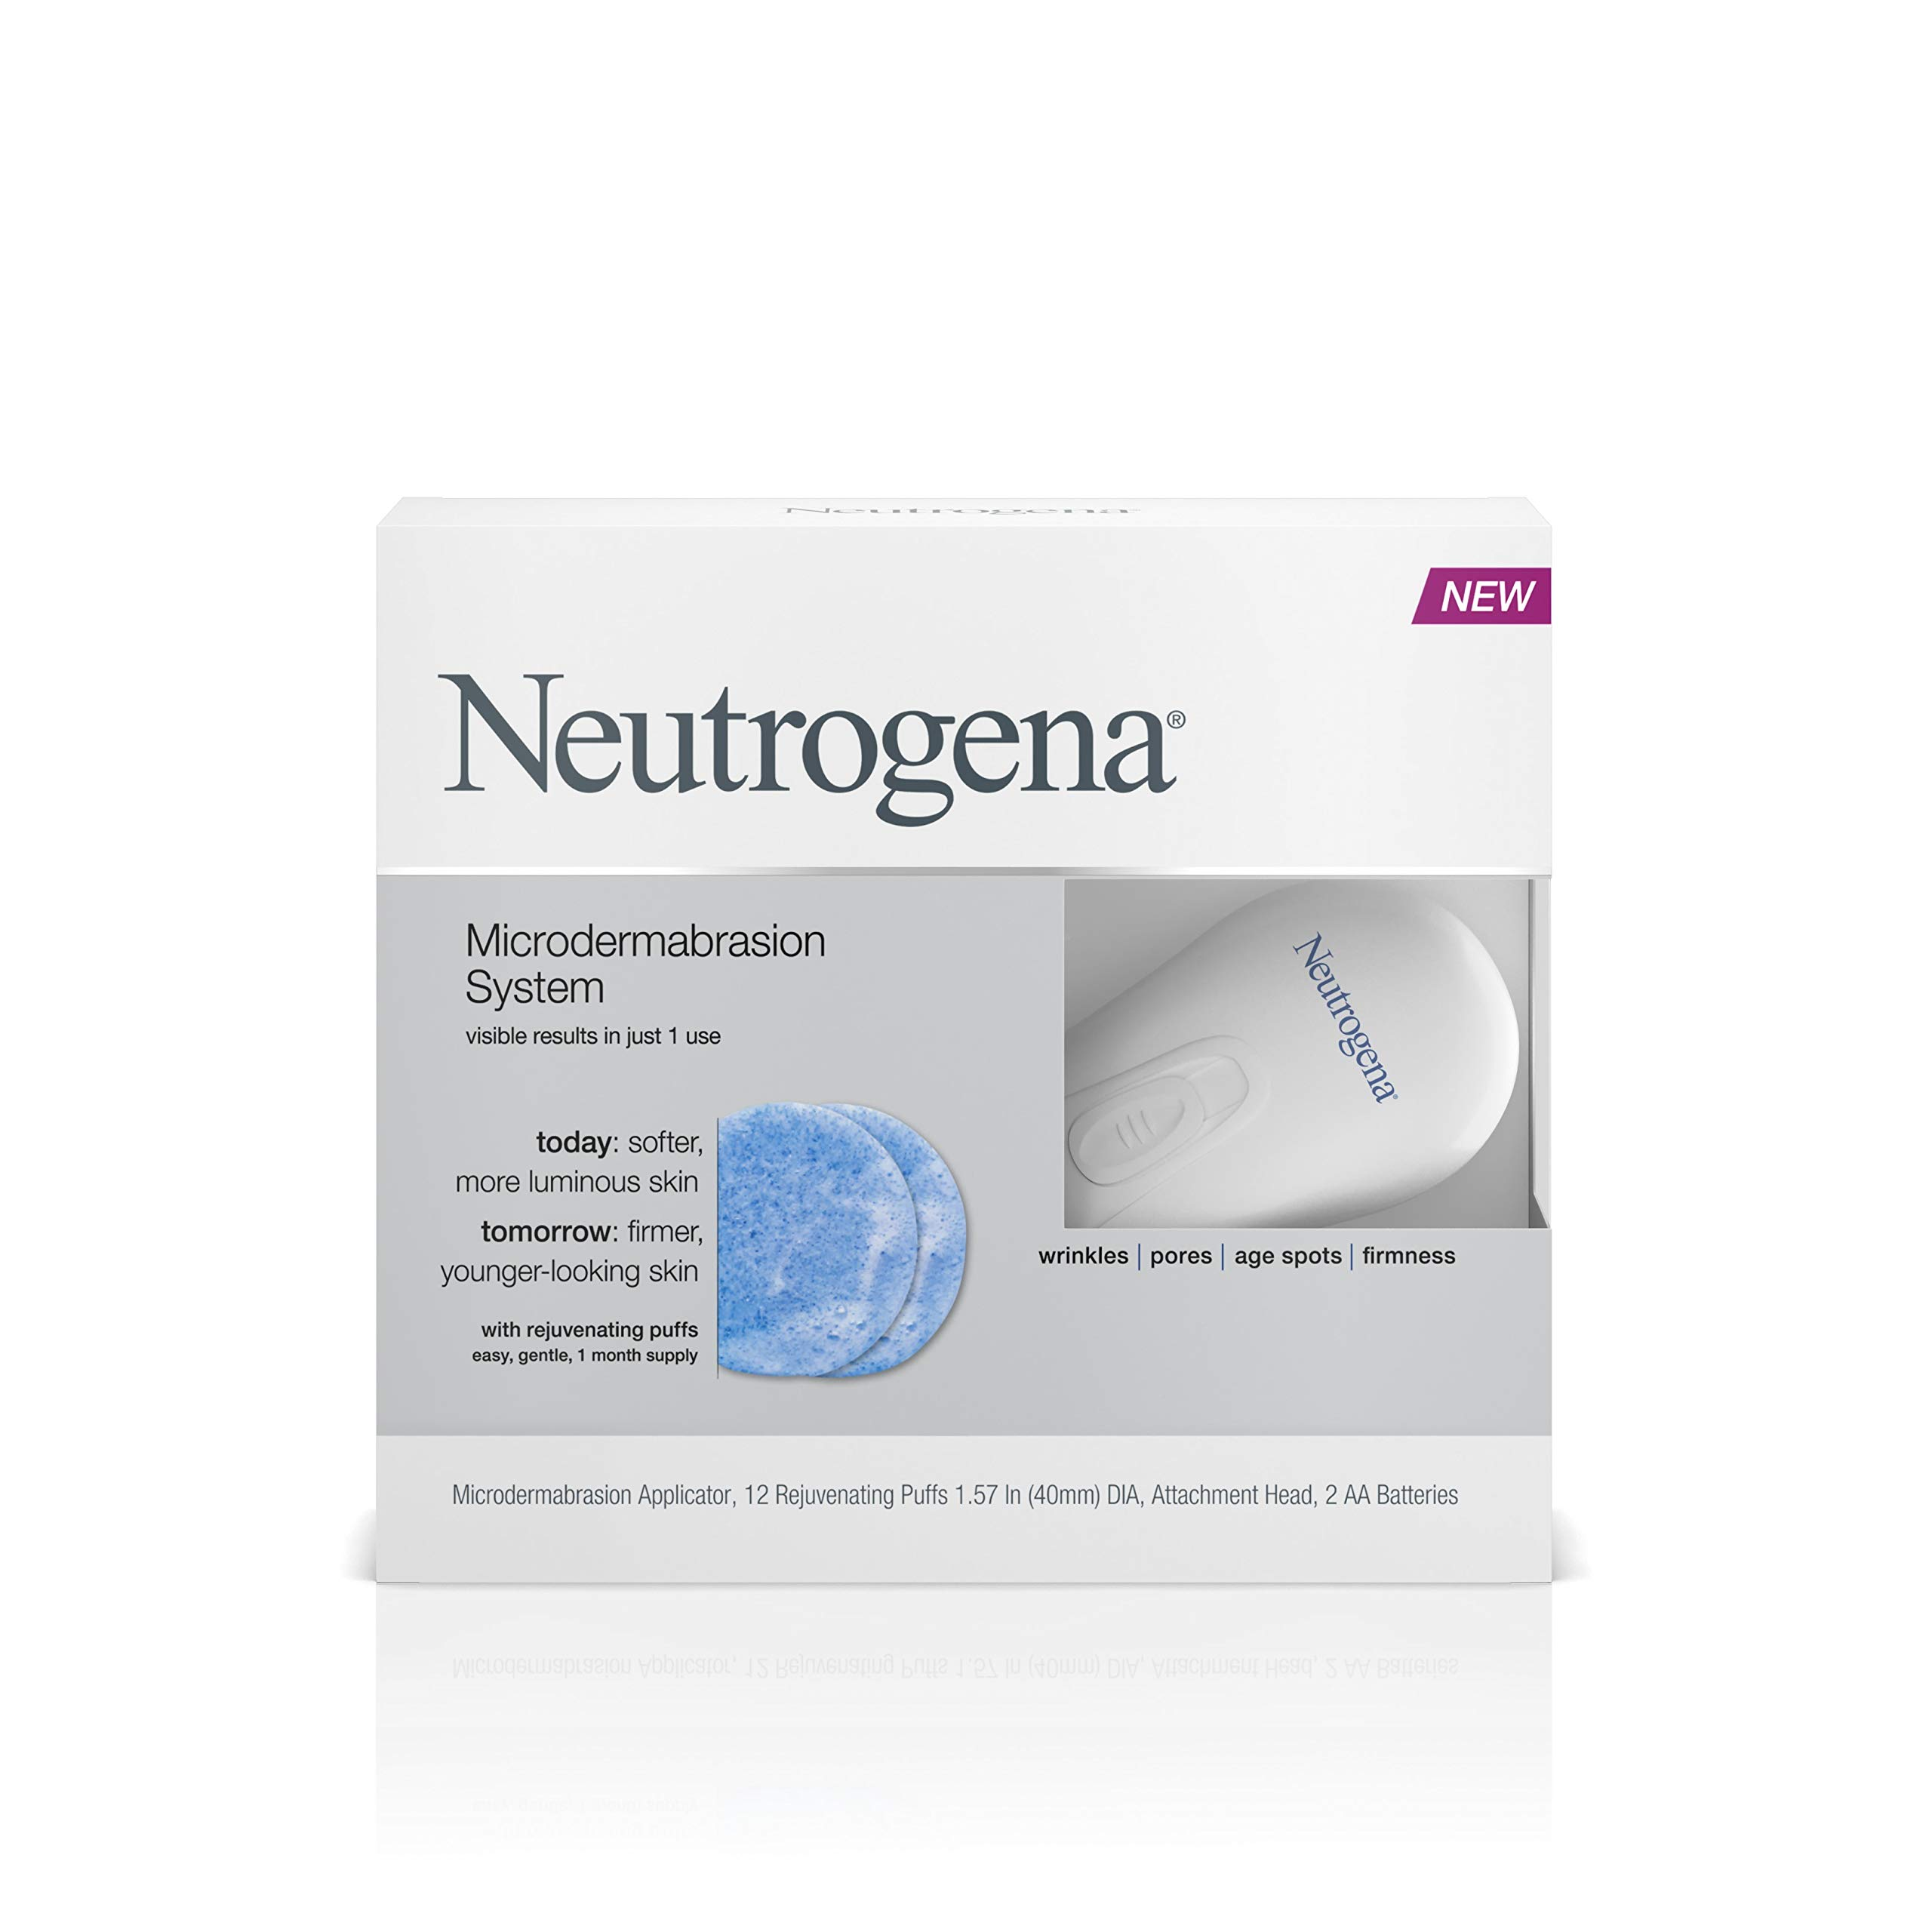 Neutrogena Microdermabrasion Starter Kit - At-home skin exfoliating and firming facial system